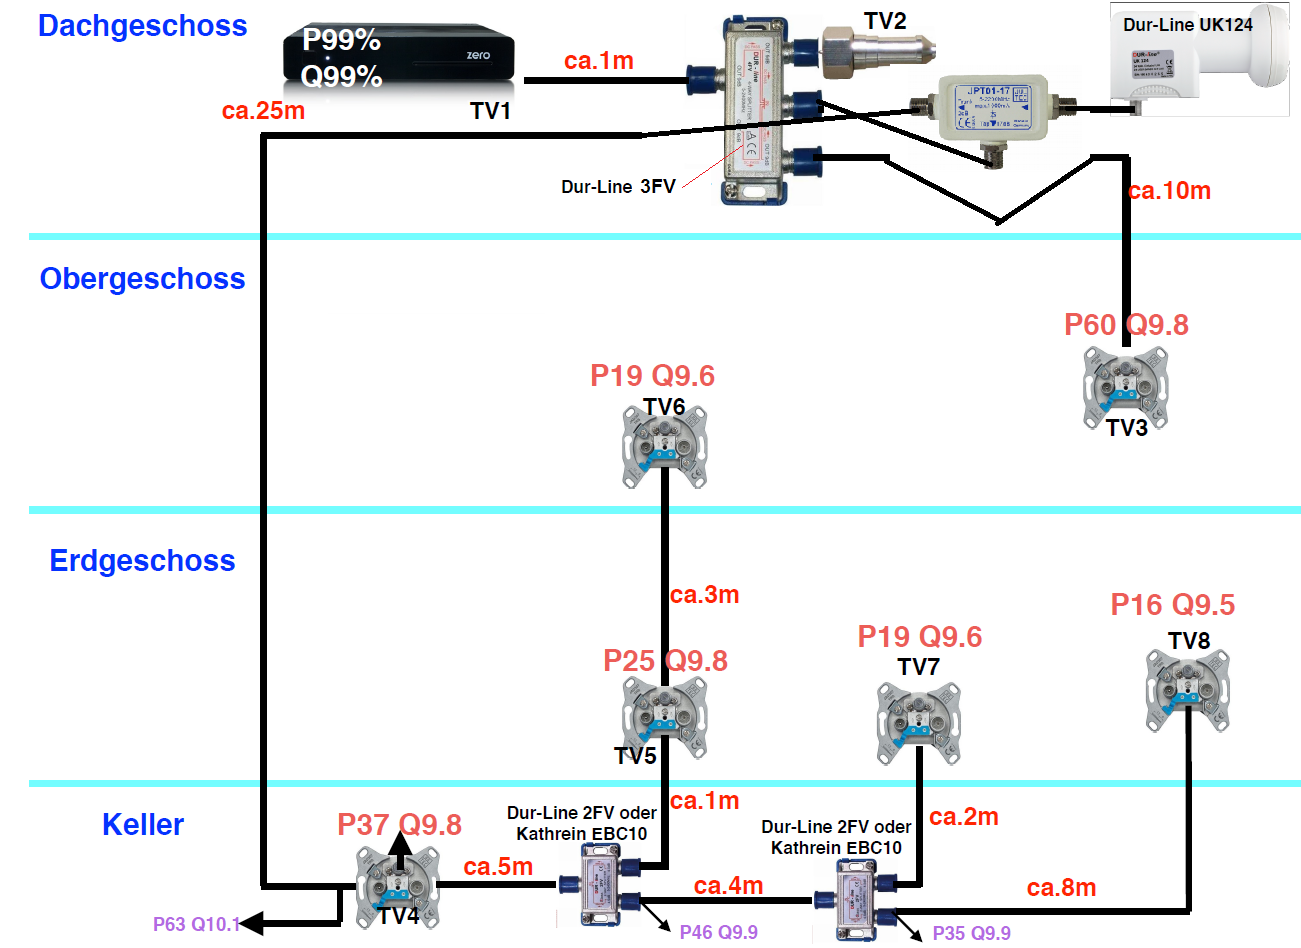 Dur-Line_JESS-LNB_UK124_Anlagenplanung_Satanlage.png